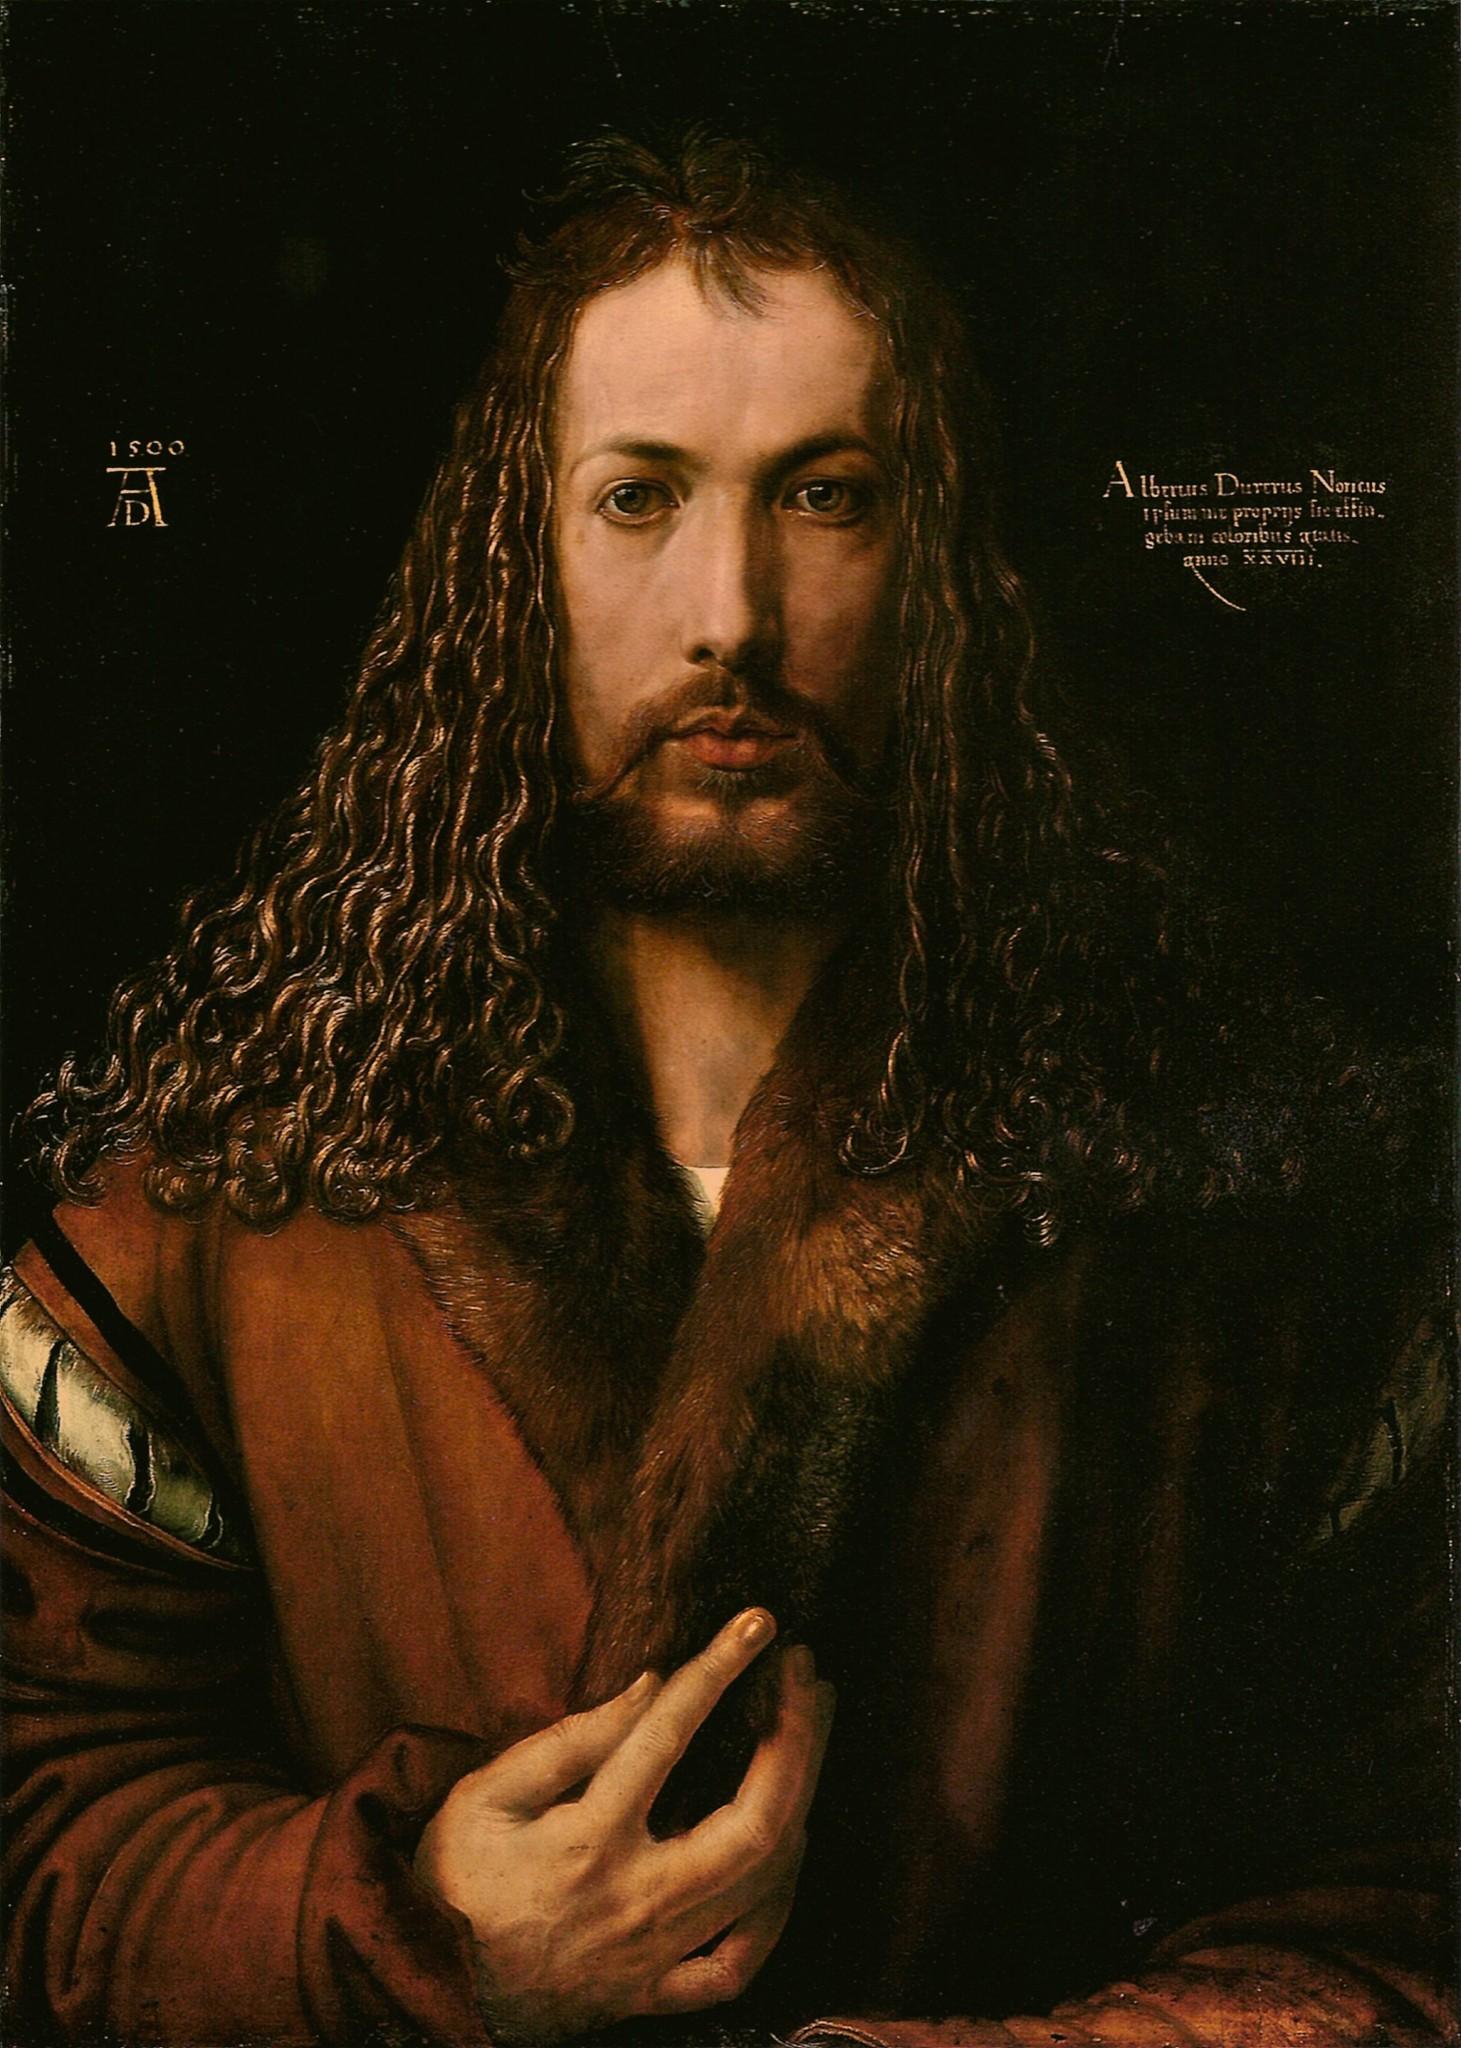 Albrecht Dürer (1500. Автопортрет в 28 лет)